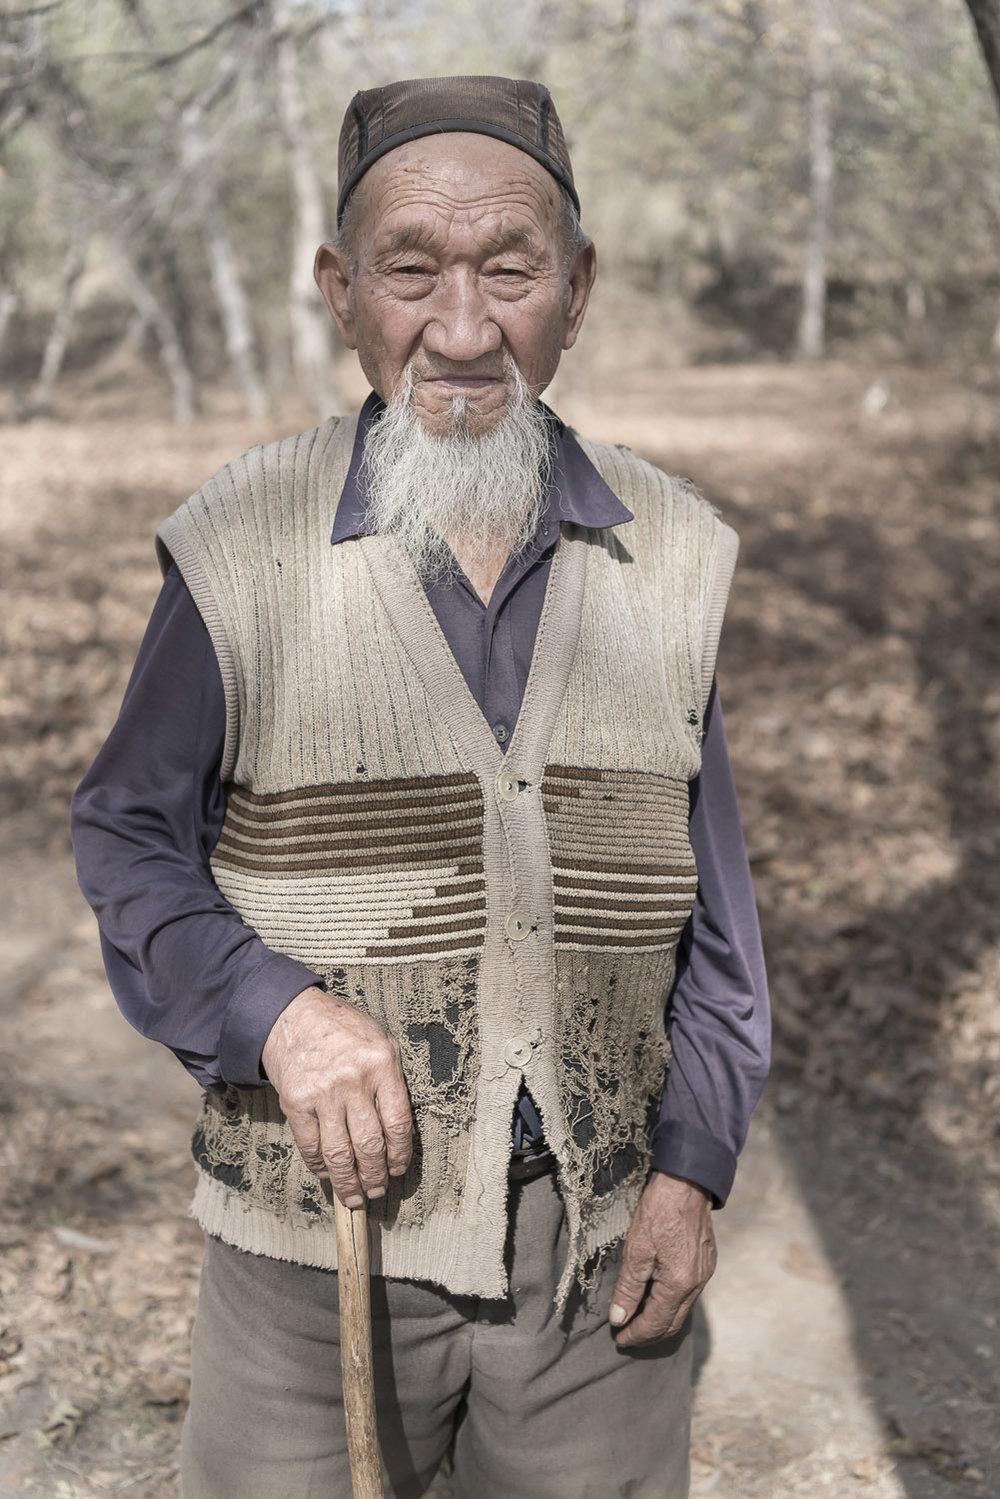 arslanbob-kyrgyzstan-portrait-jo-kearney-photography-video-cheltenham.jpg